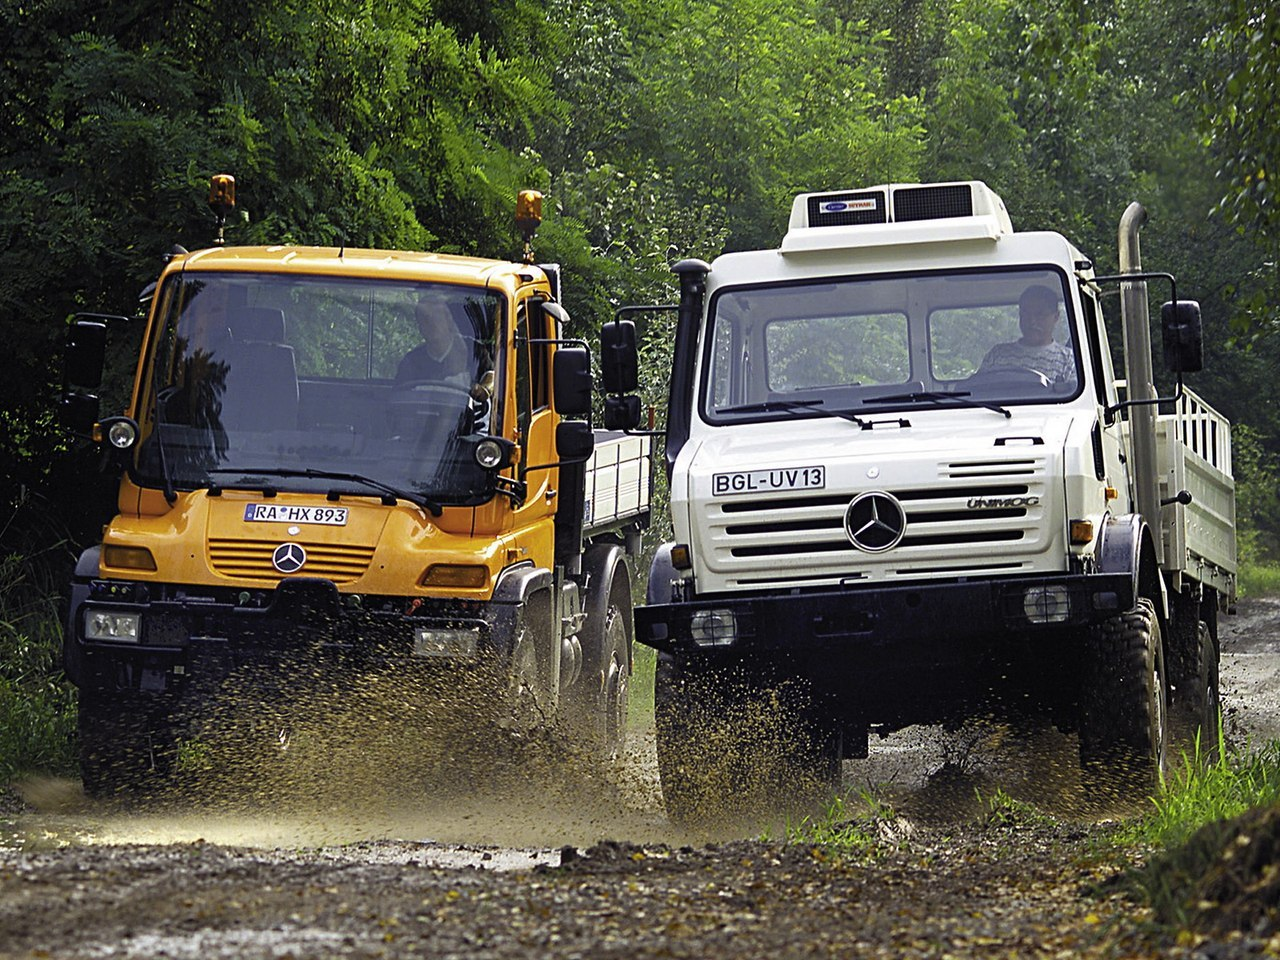 mercedes-benz-unimog-u-5000-6x6-4 - Cars One Love